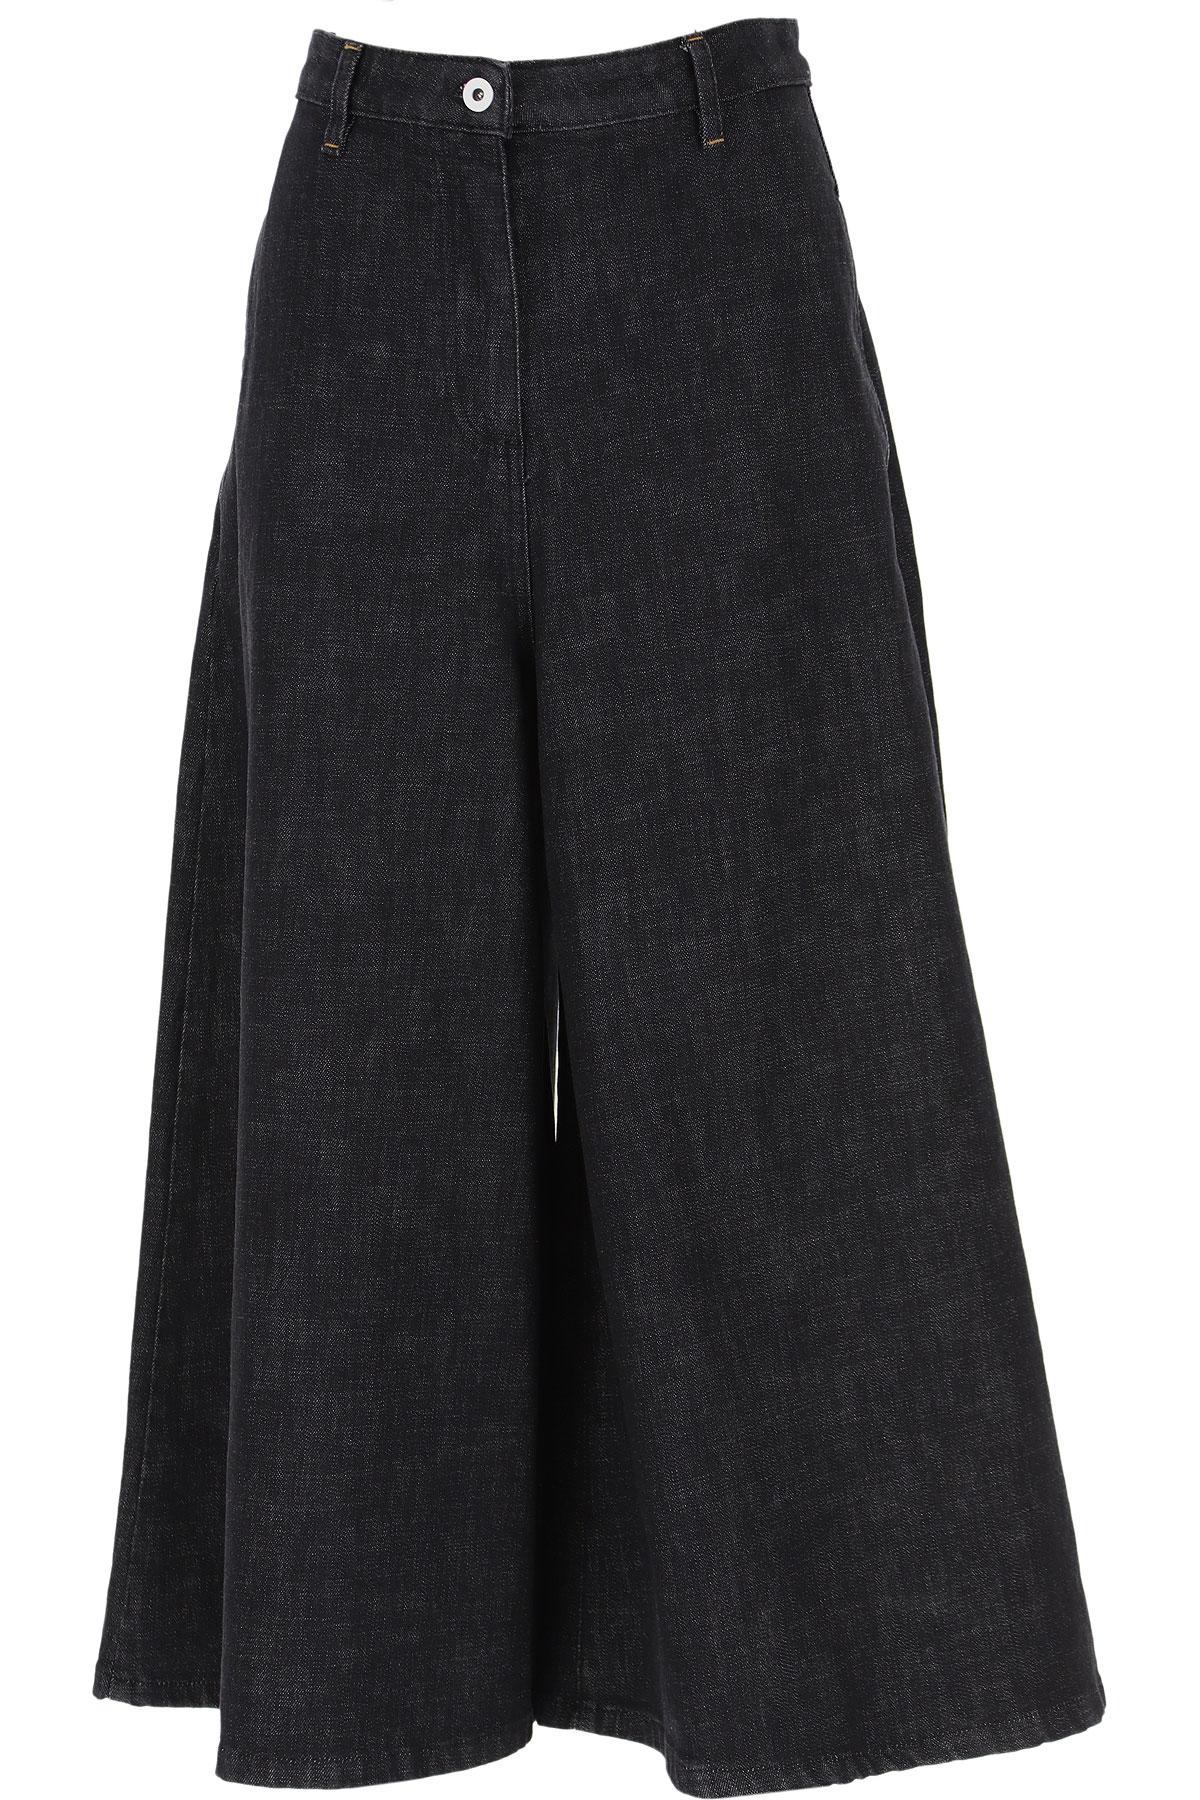 Alexander McQueen McQ Jeans On Sale, Black, Cotton, 2019, 10 2 4 6